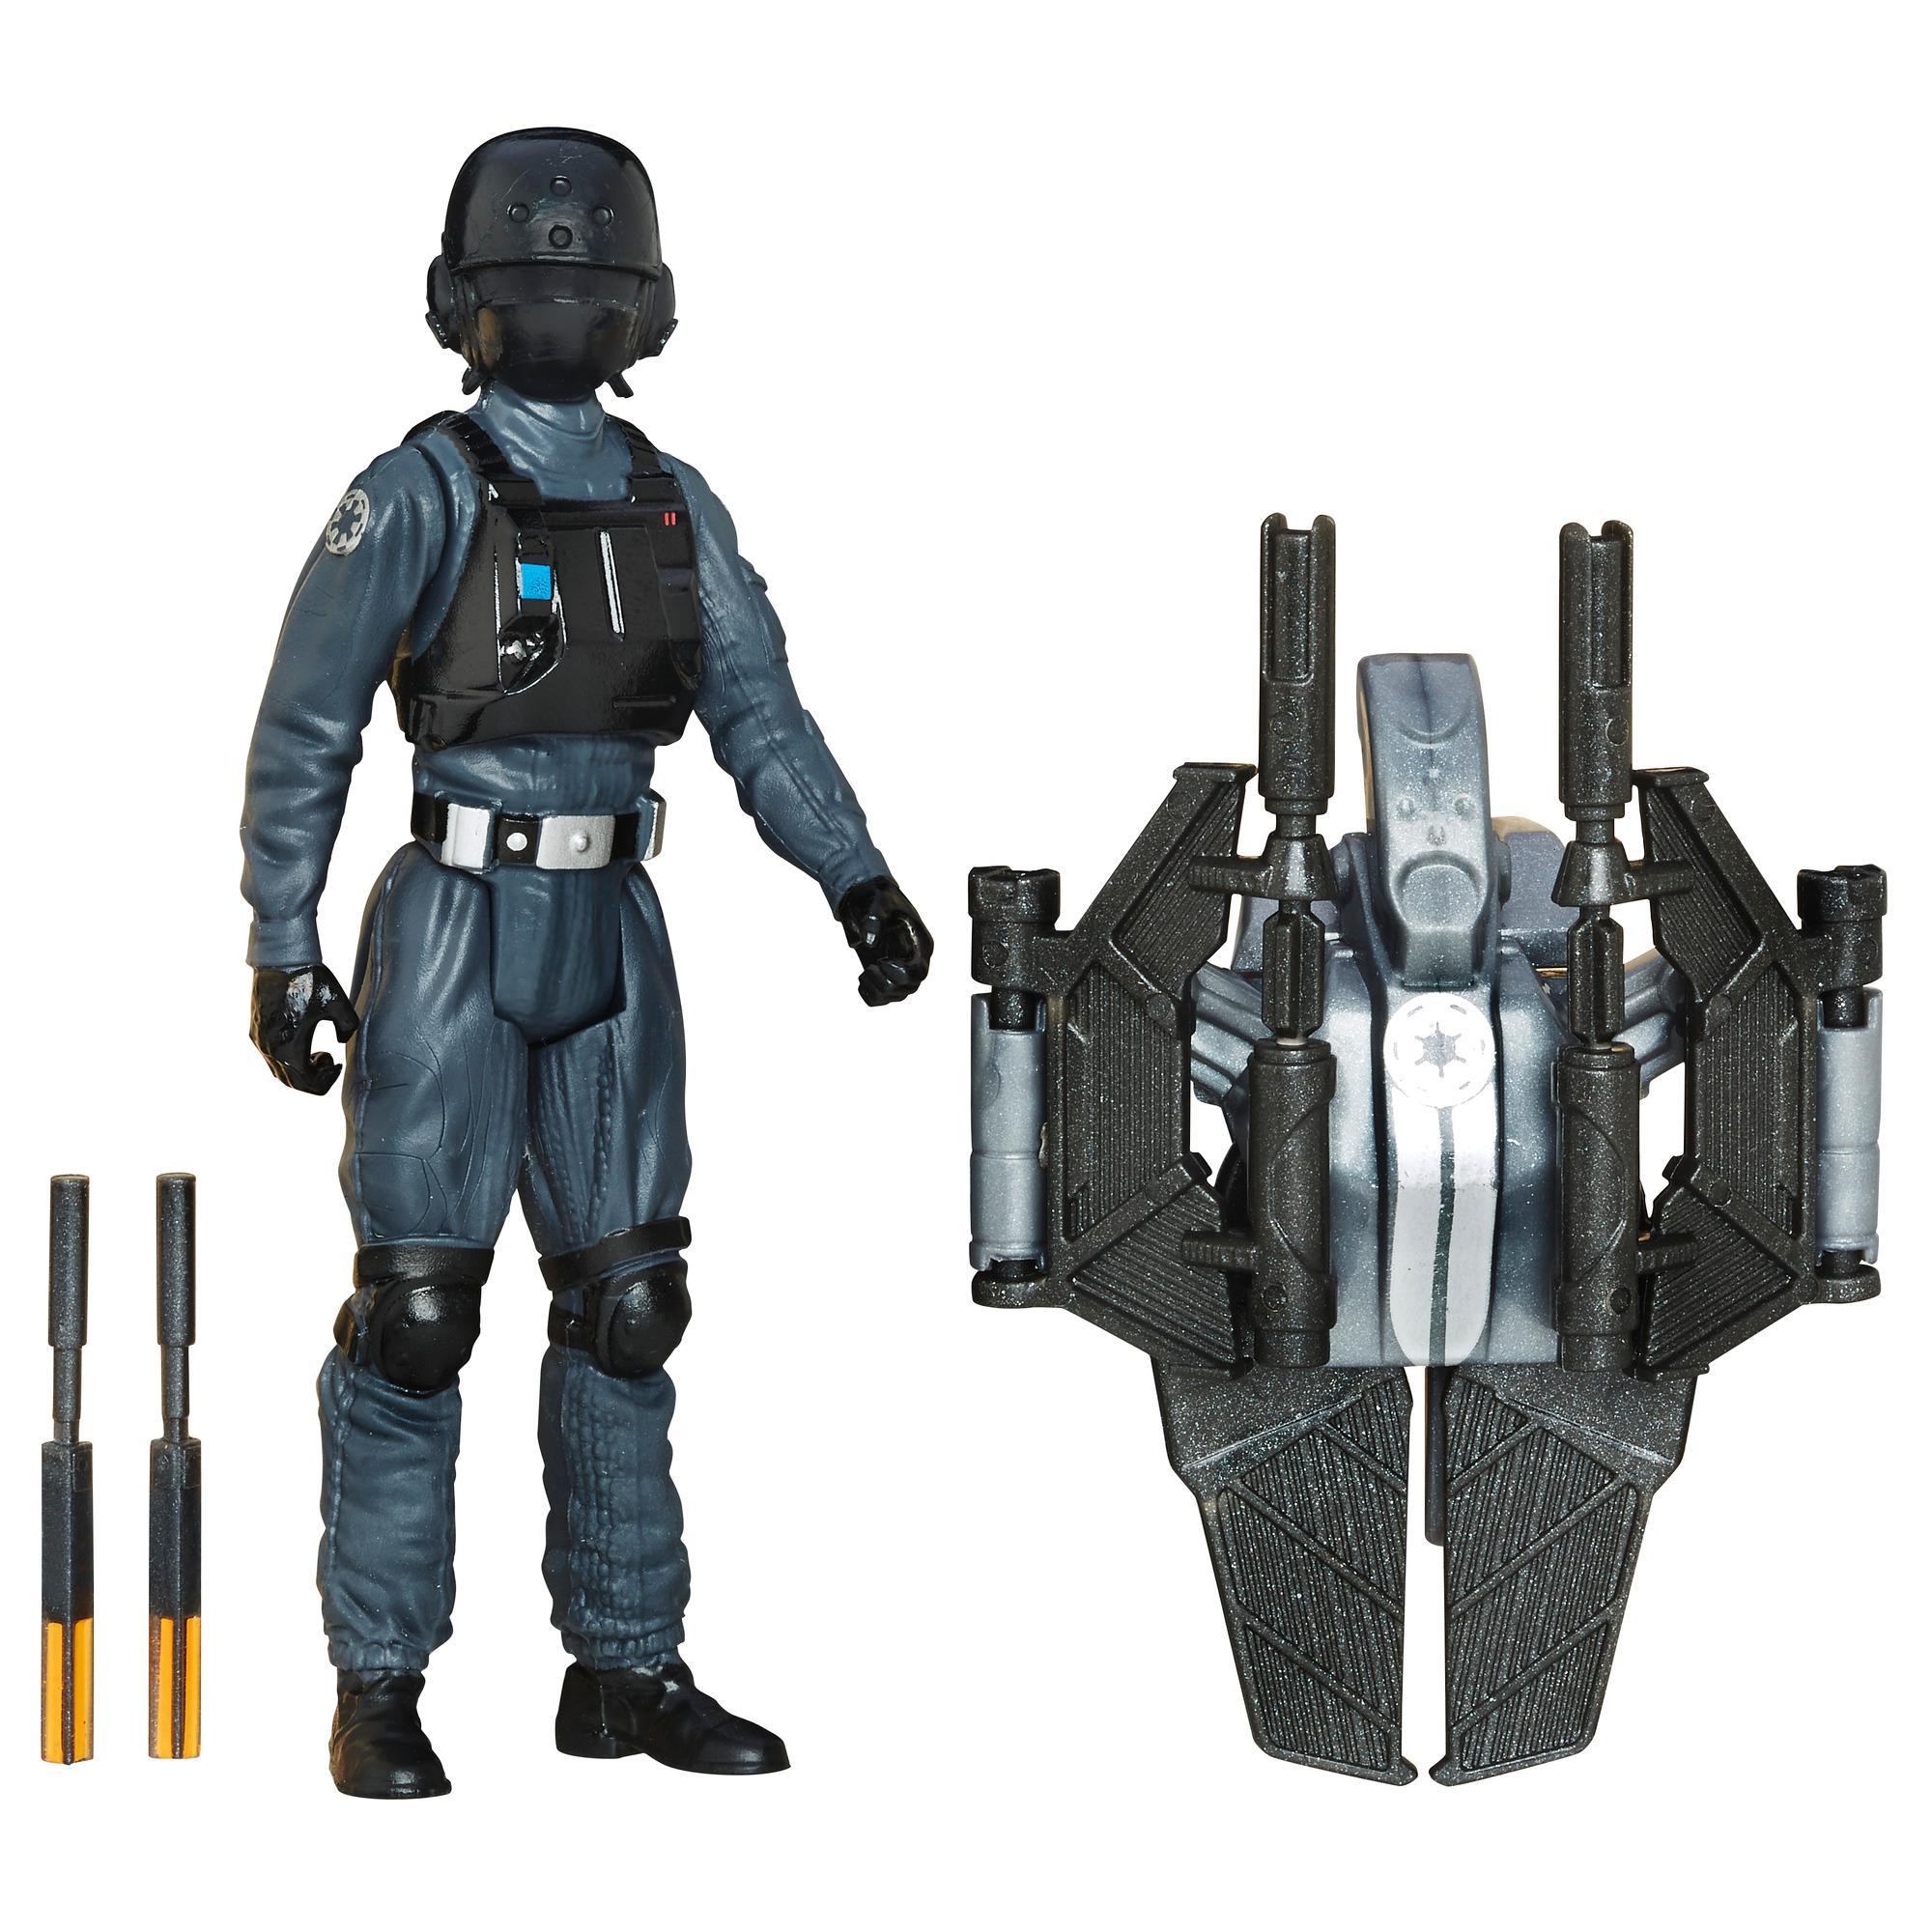 Figura Star Wars Rogue One - Equipe de solo Imperial